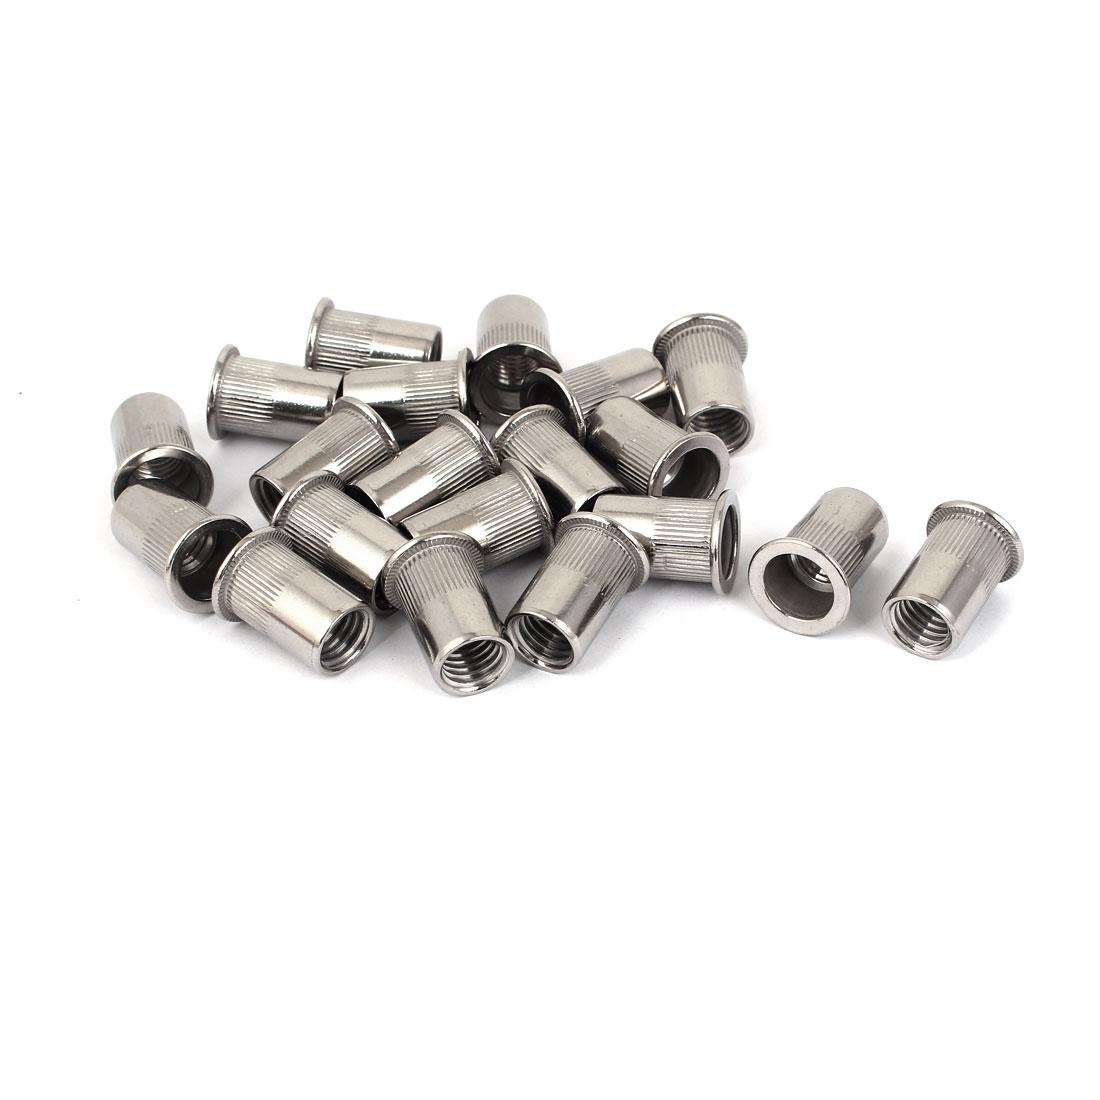 M12 Stainless Steel Flat Head Rivet Nut Insert Nutsert Silver Tone 20pcs